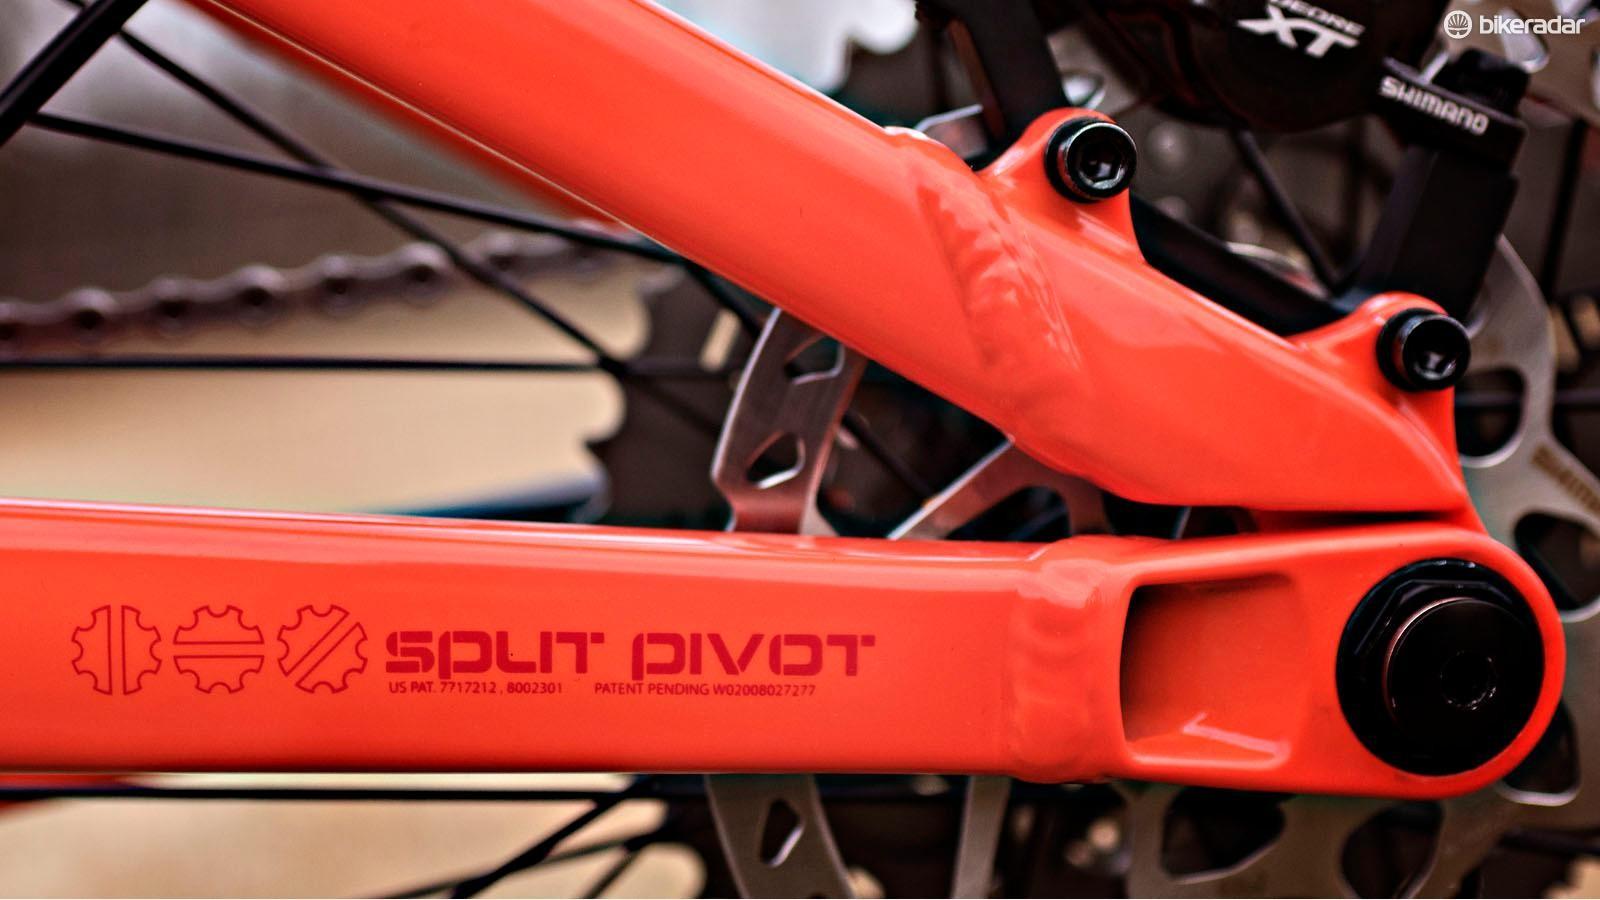 The Deadwood SUS relies on the Split Pivot suspension system